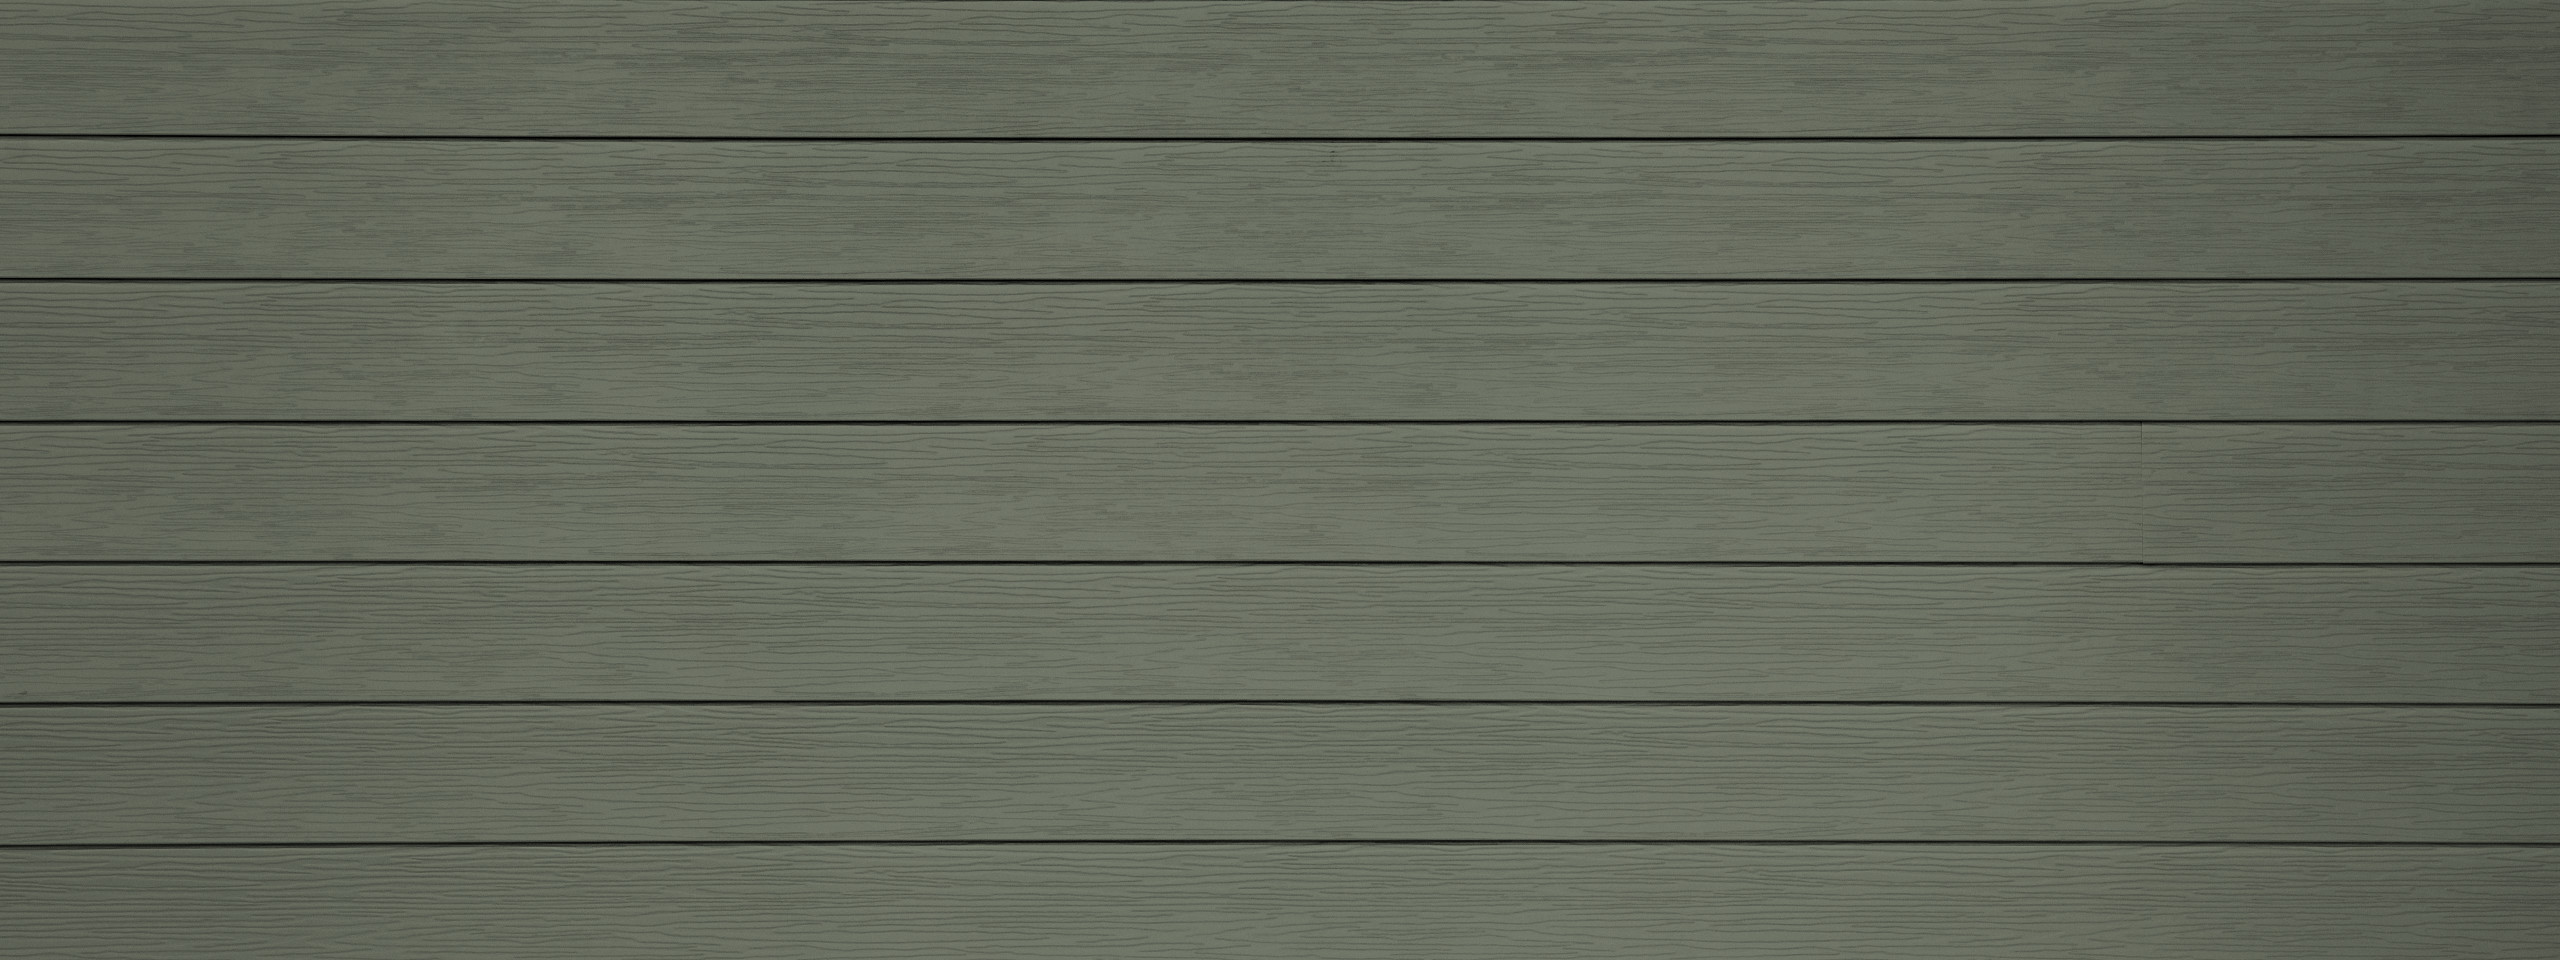 Entex traditional lap sage horizontal steel siding